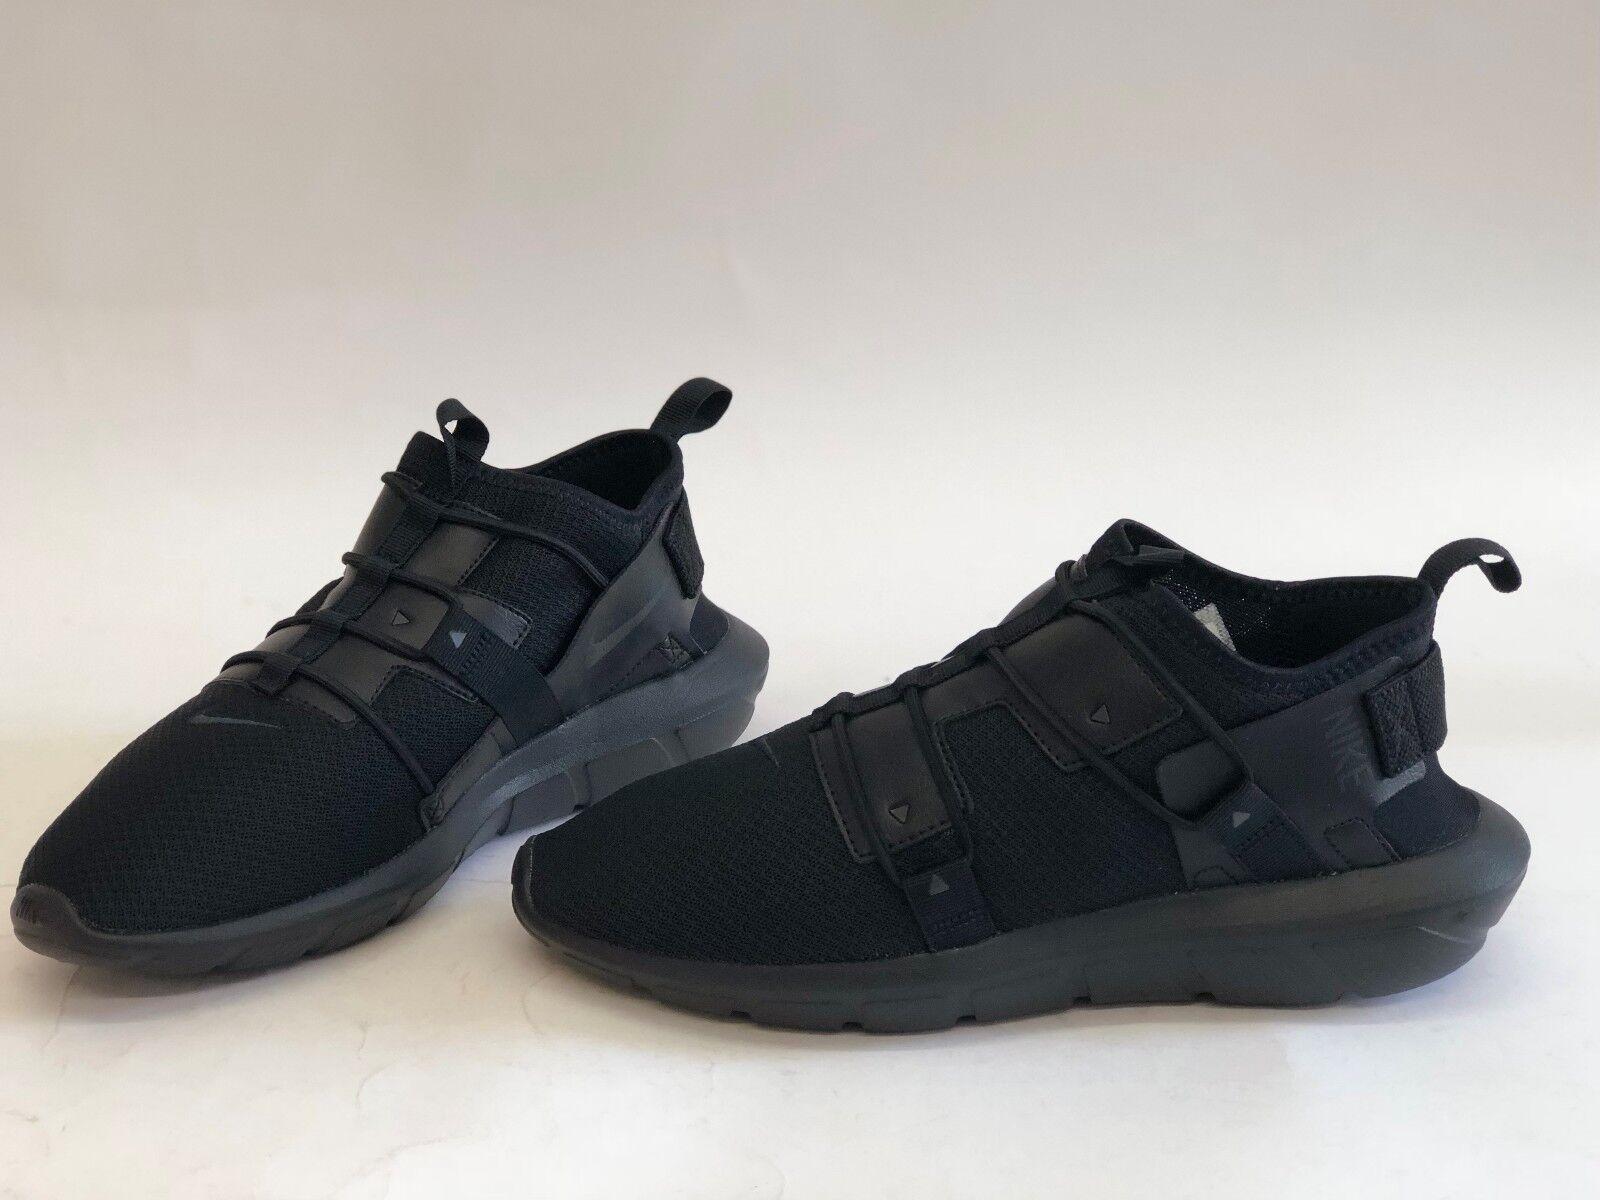 Pennino Uomo 44 nike vortak in scarpe da ginnastica aa2194-005 nero